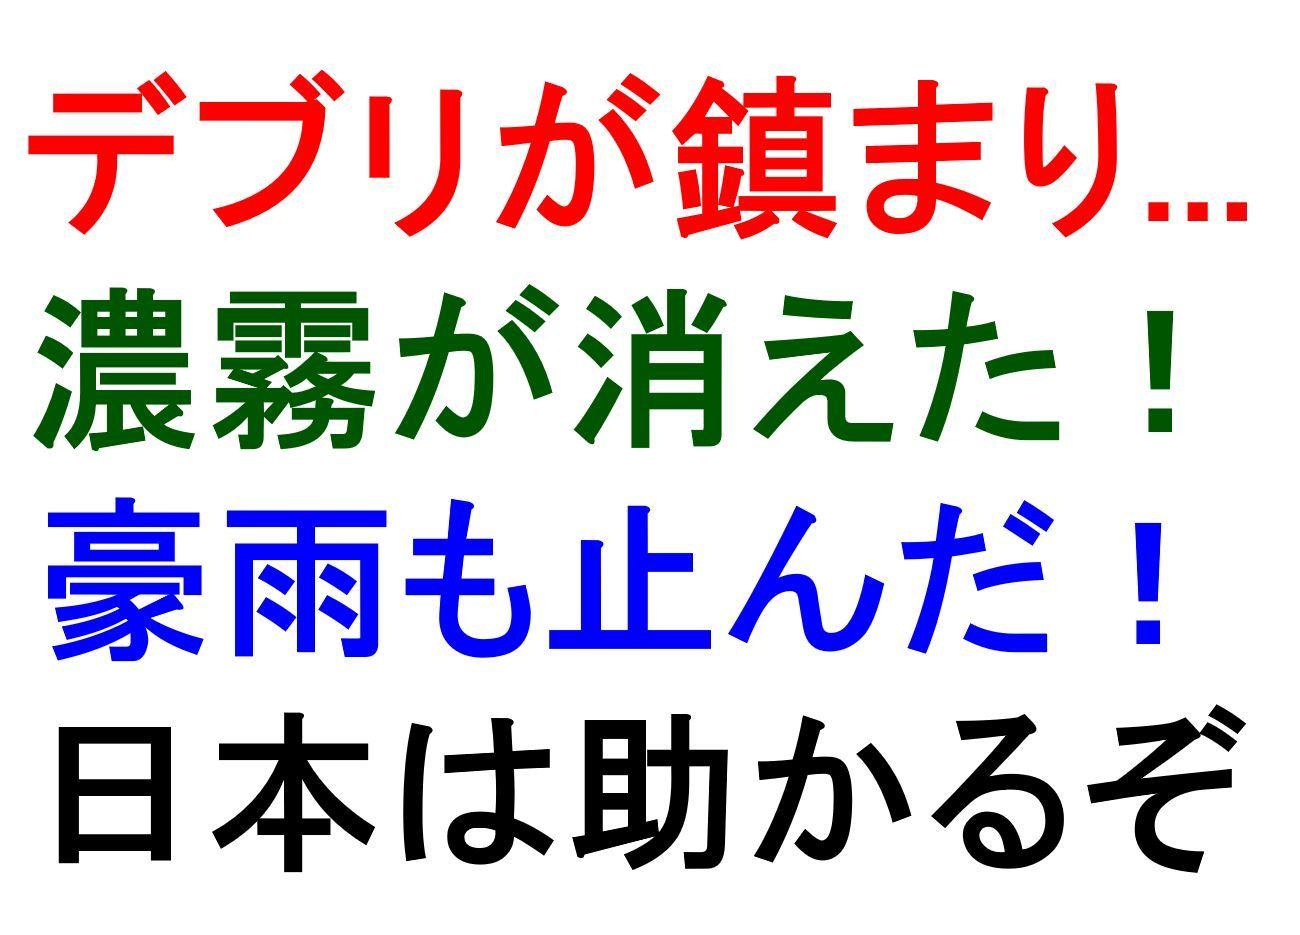 20170612-01-JapanOK.jpg